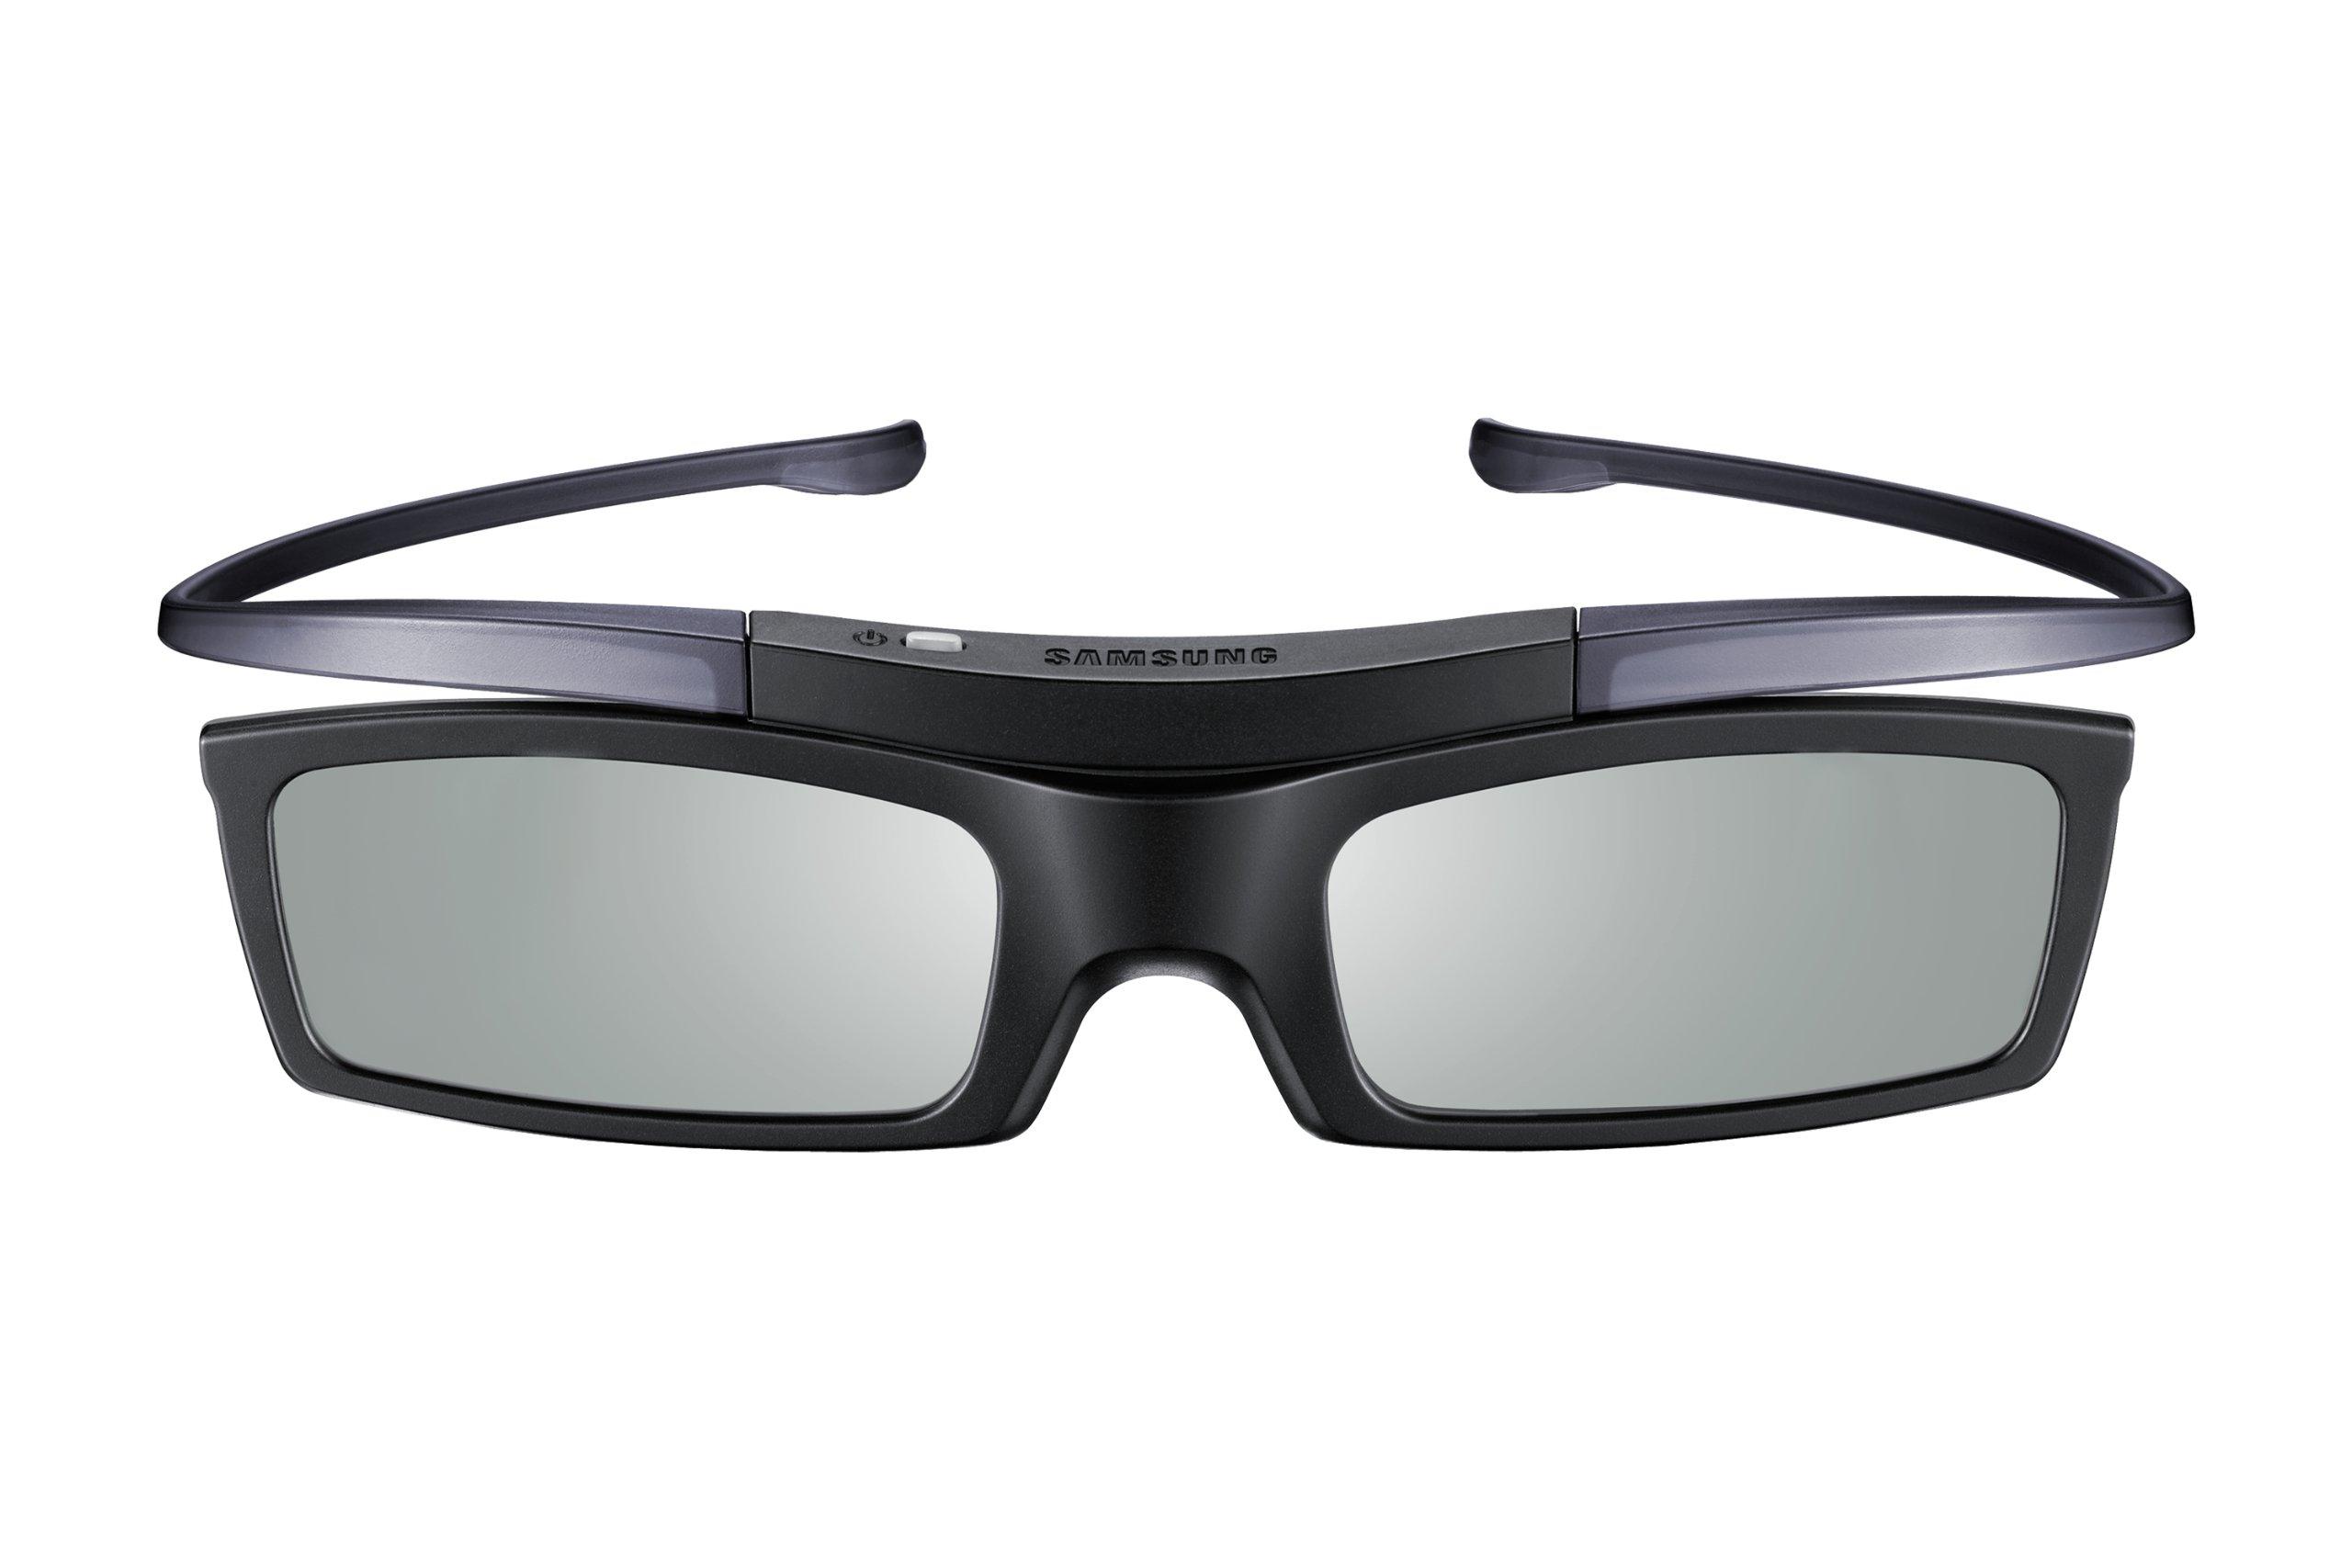 Samsung 2013 Battery Type 3D Glasses